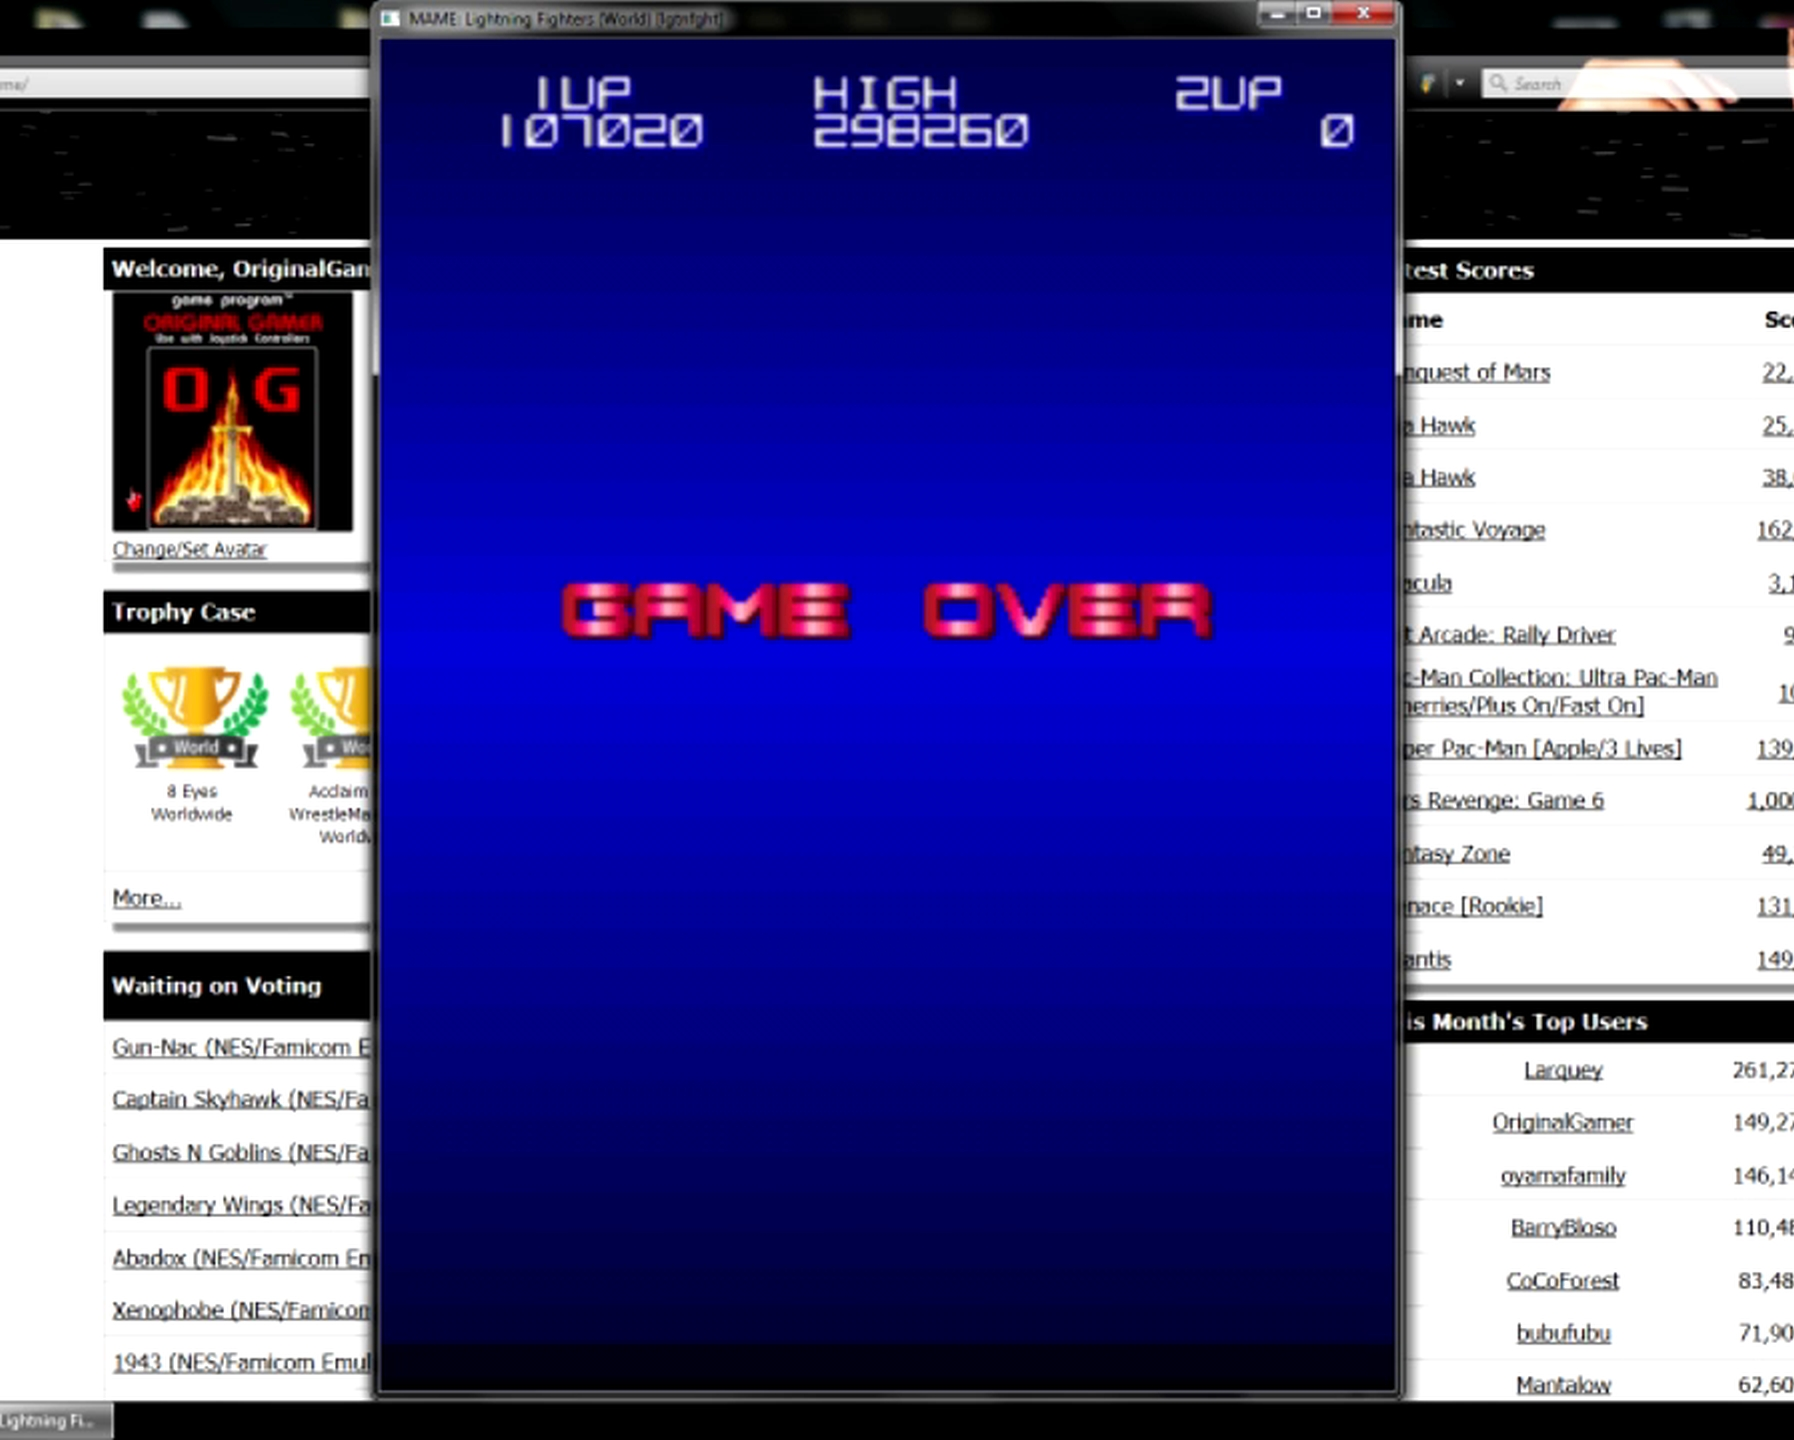 OriginalGamer: Lightning Fighters [lgtnfght] (Arcade Emulated / M.A.M.E.) 107,020 points on 2015-05-11 13:28:23